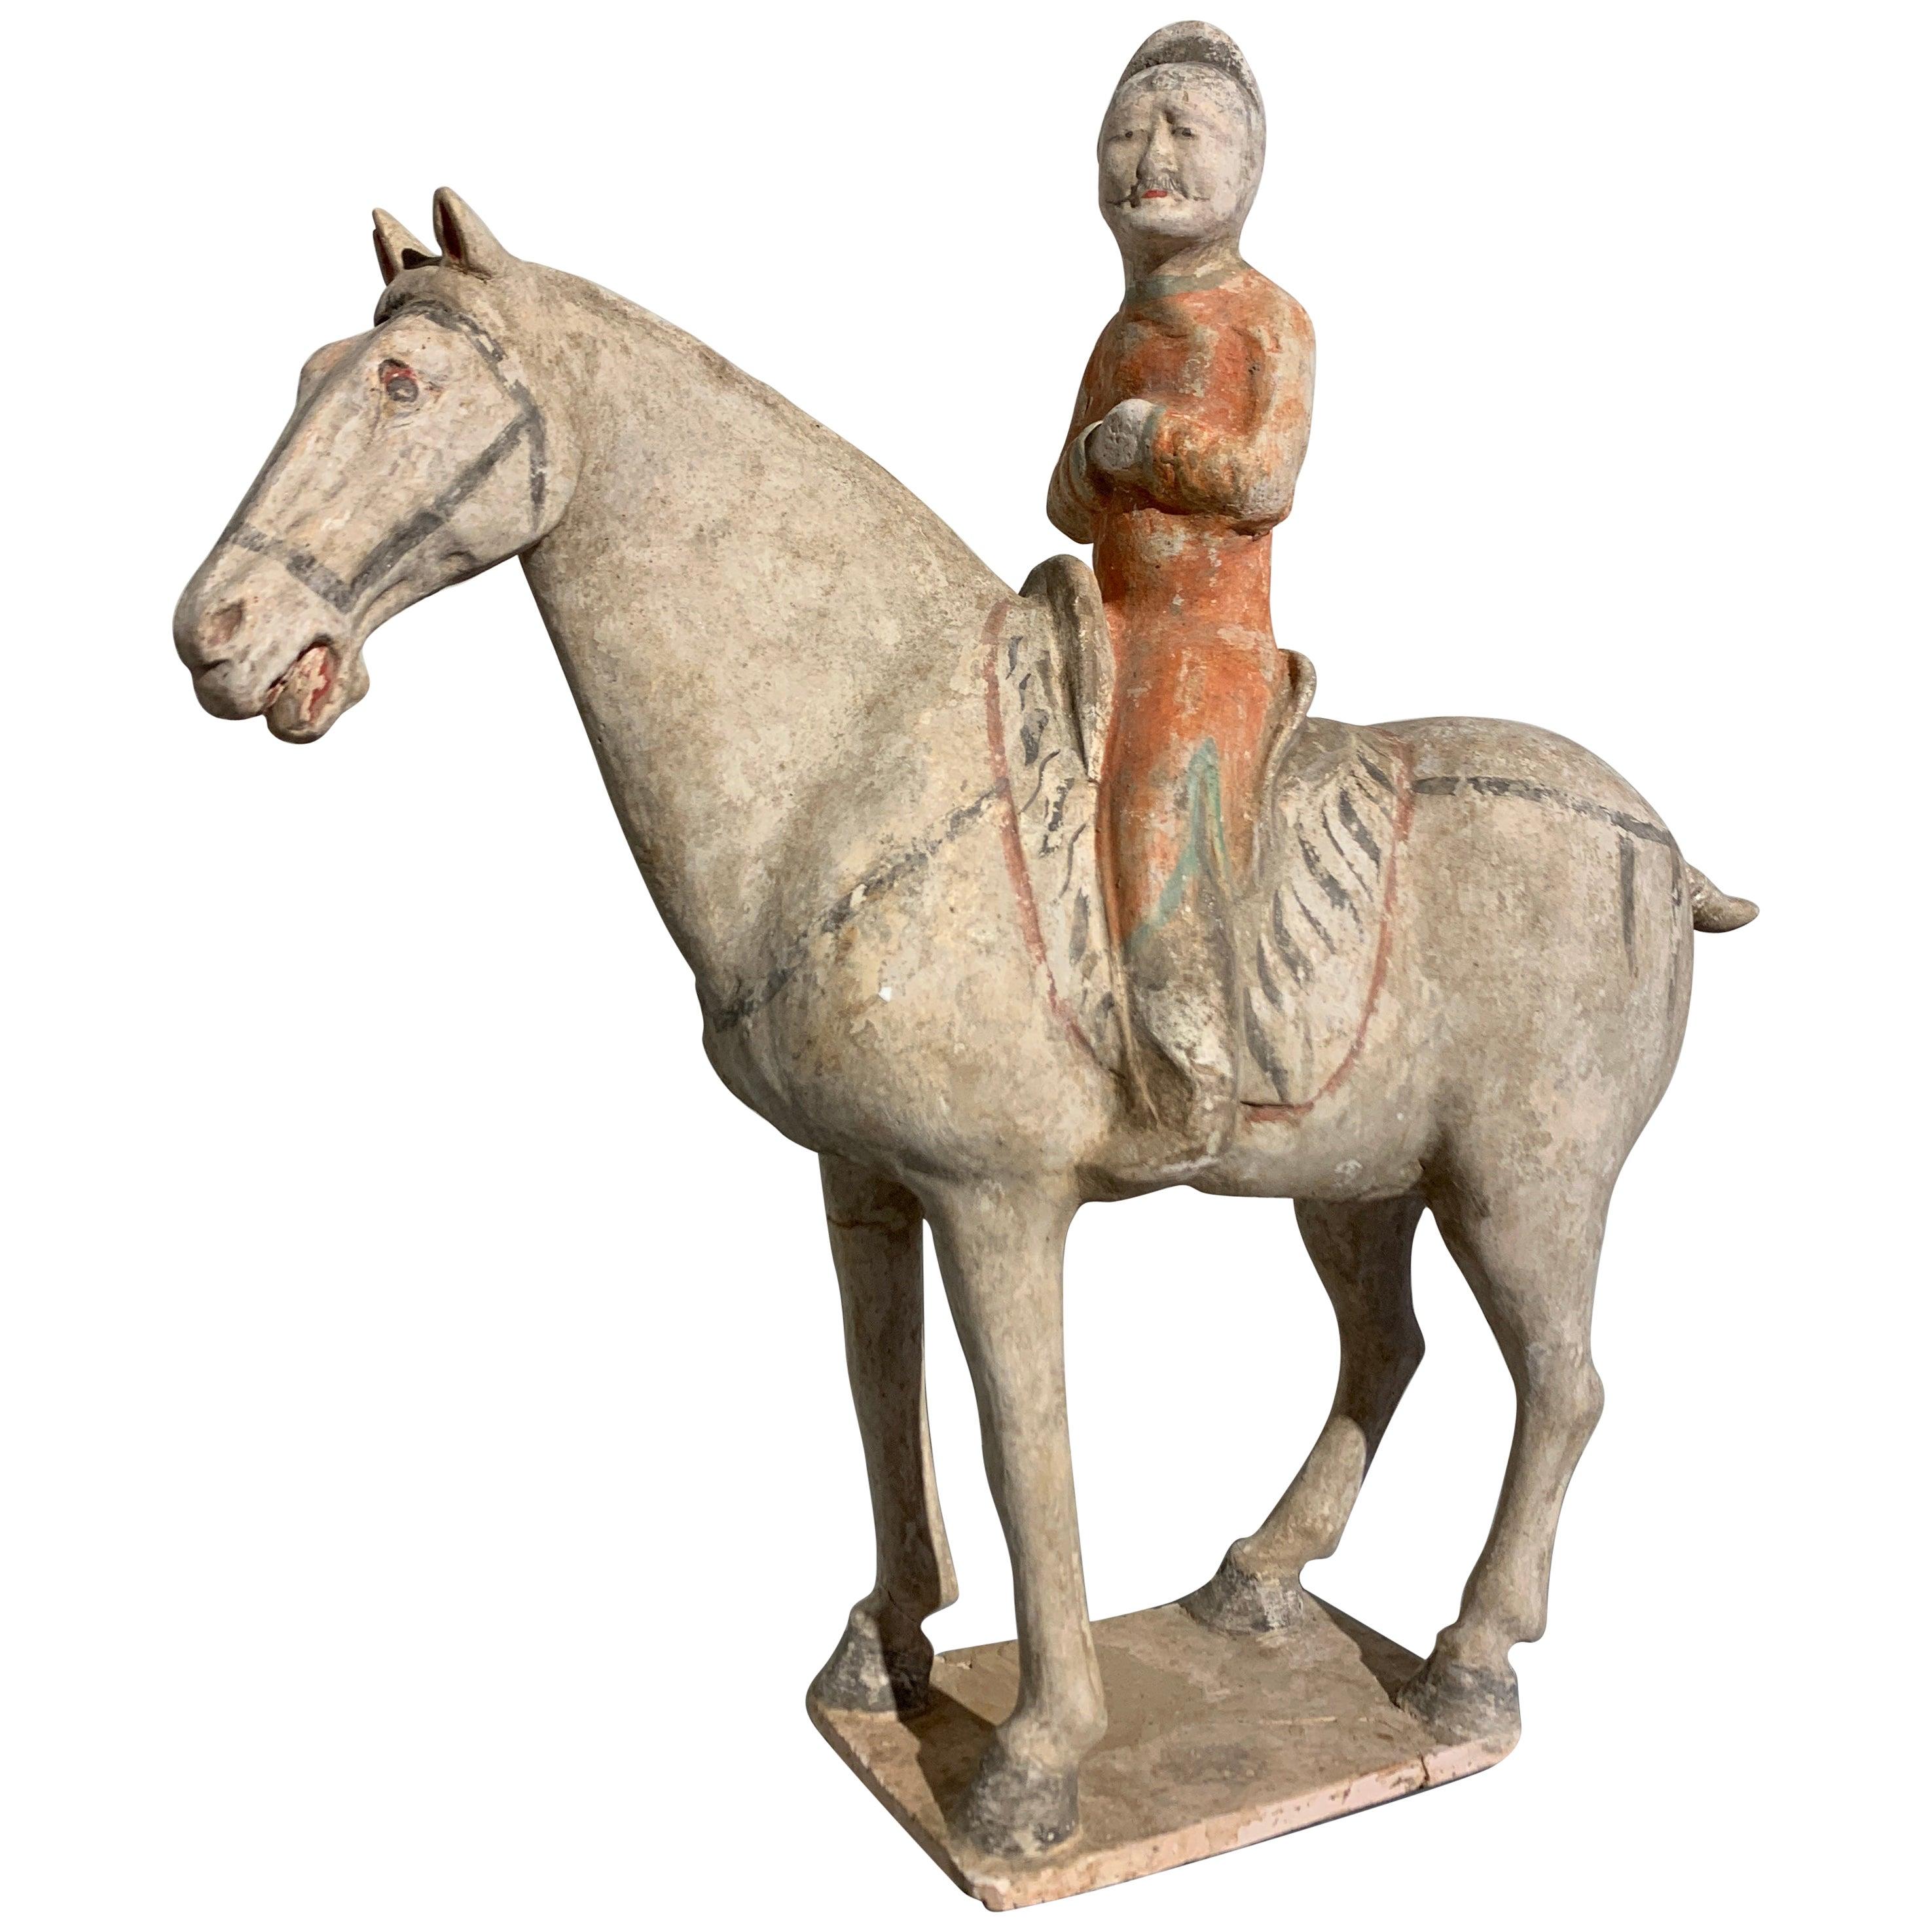 Tang Dynasty Horse and Rider, Painted Pottery, circa 9th Century, China